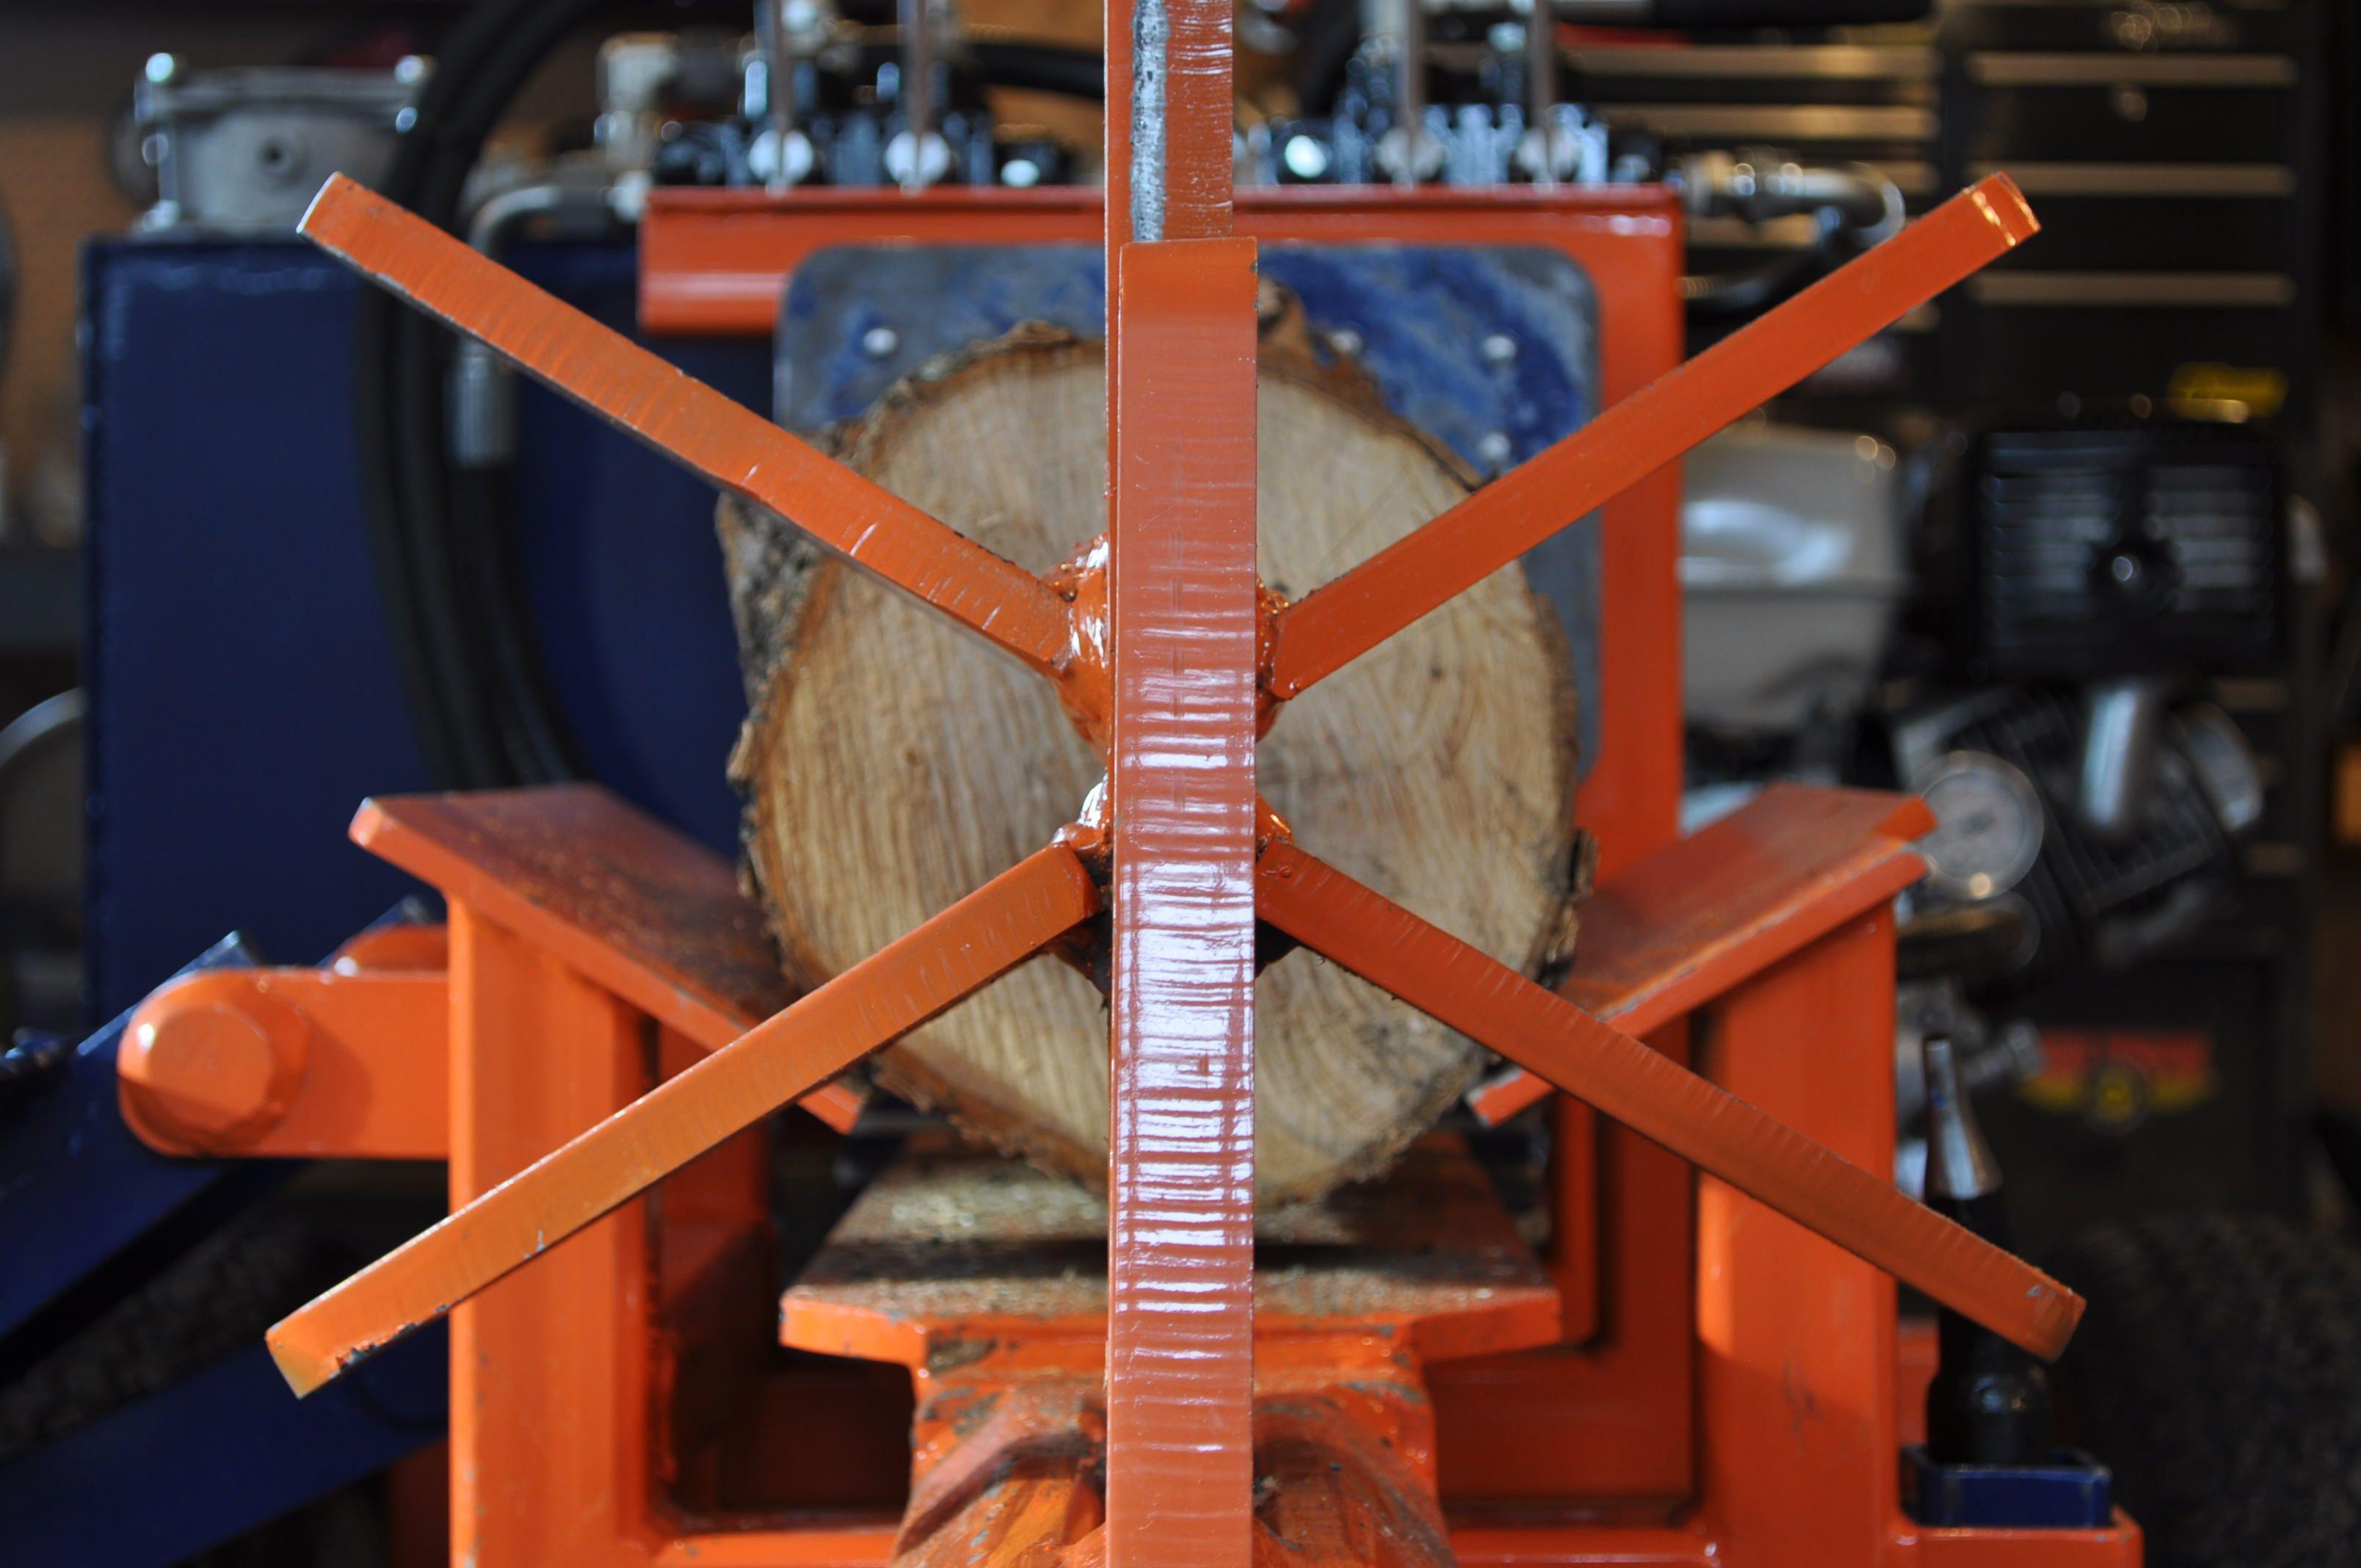 6 way wood splitter wedge and log cradle good ideas in 2019. Black Bedroom Furniture Sets. Home Design Ideas